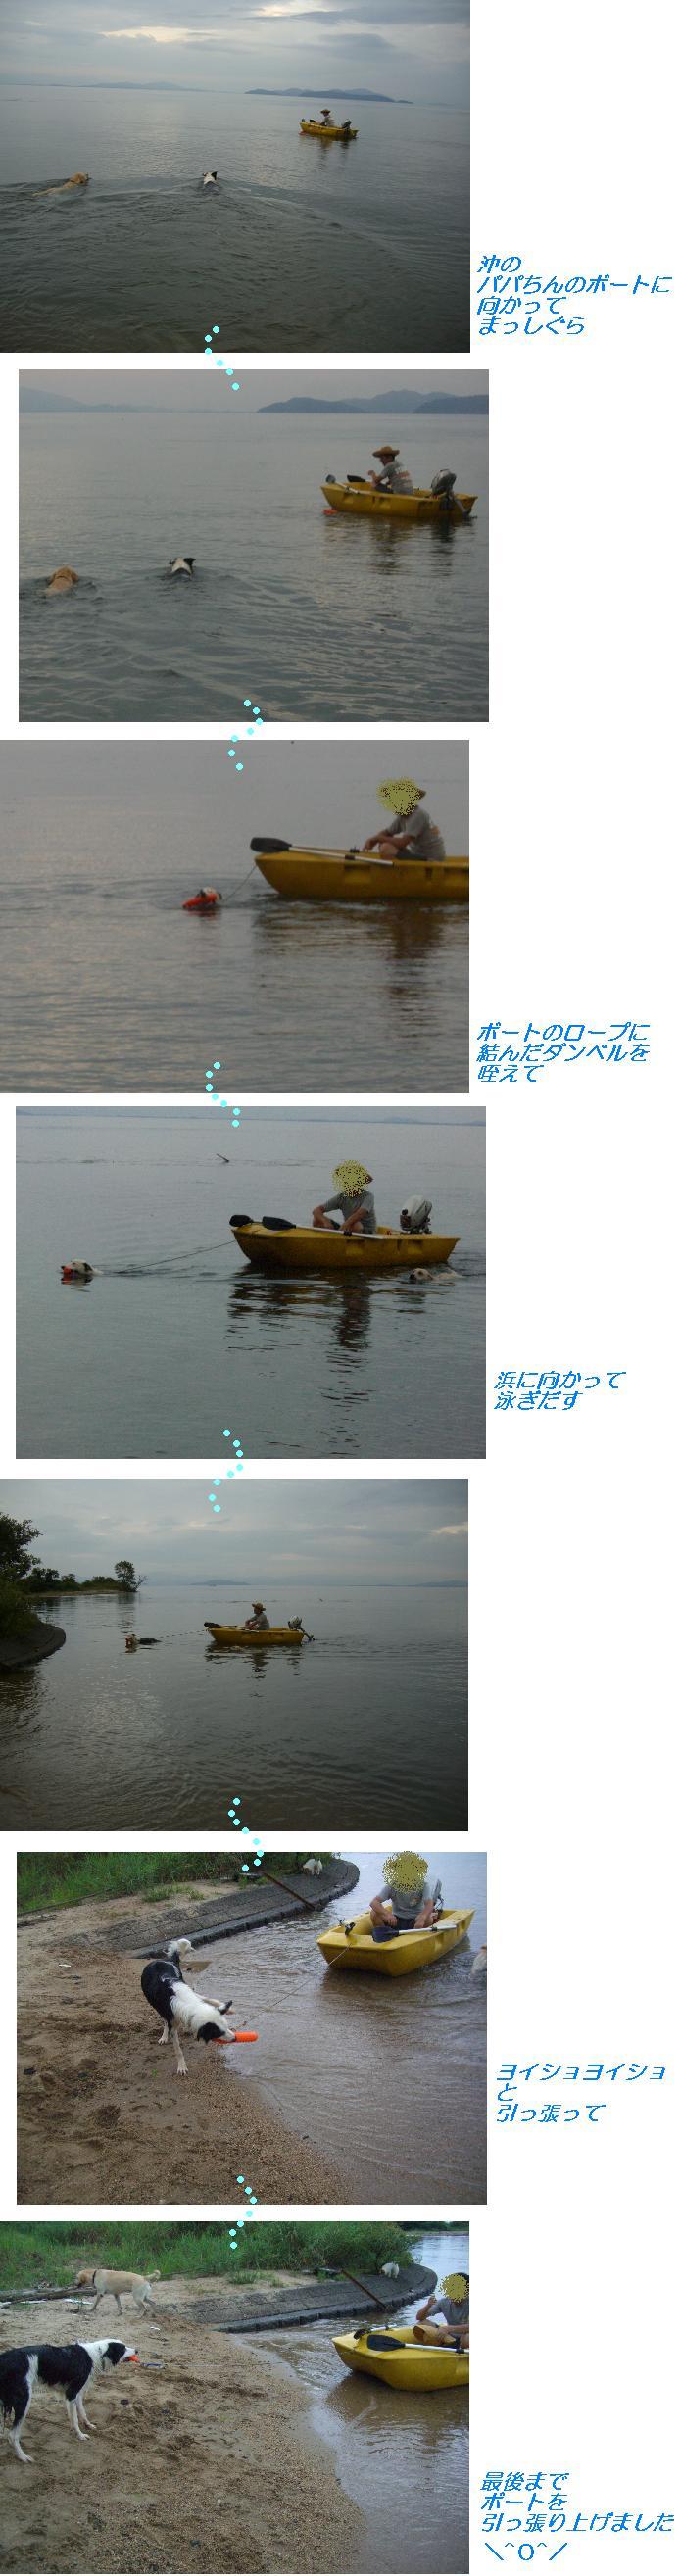 水難救助犬